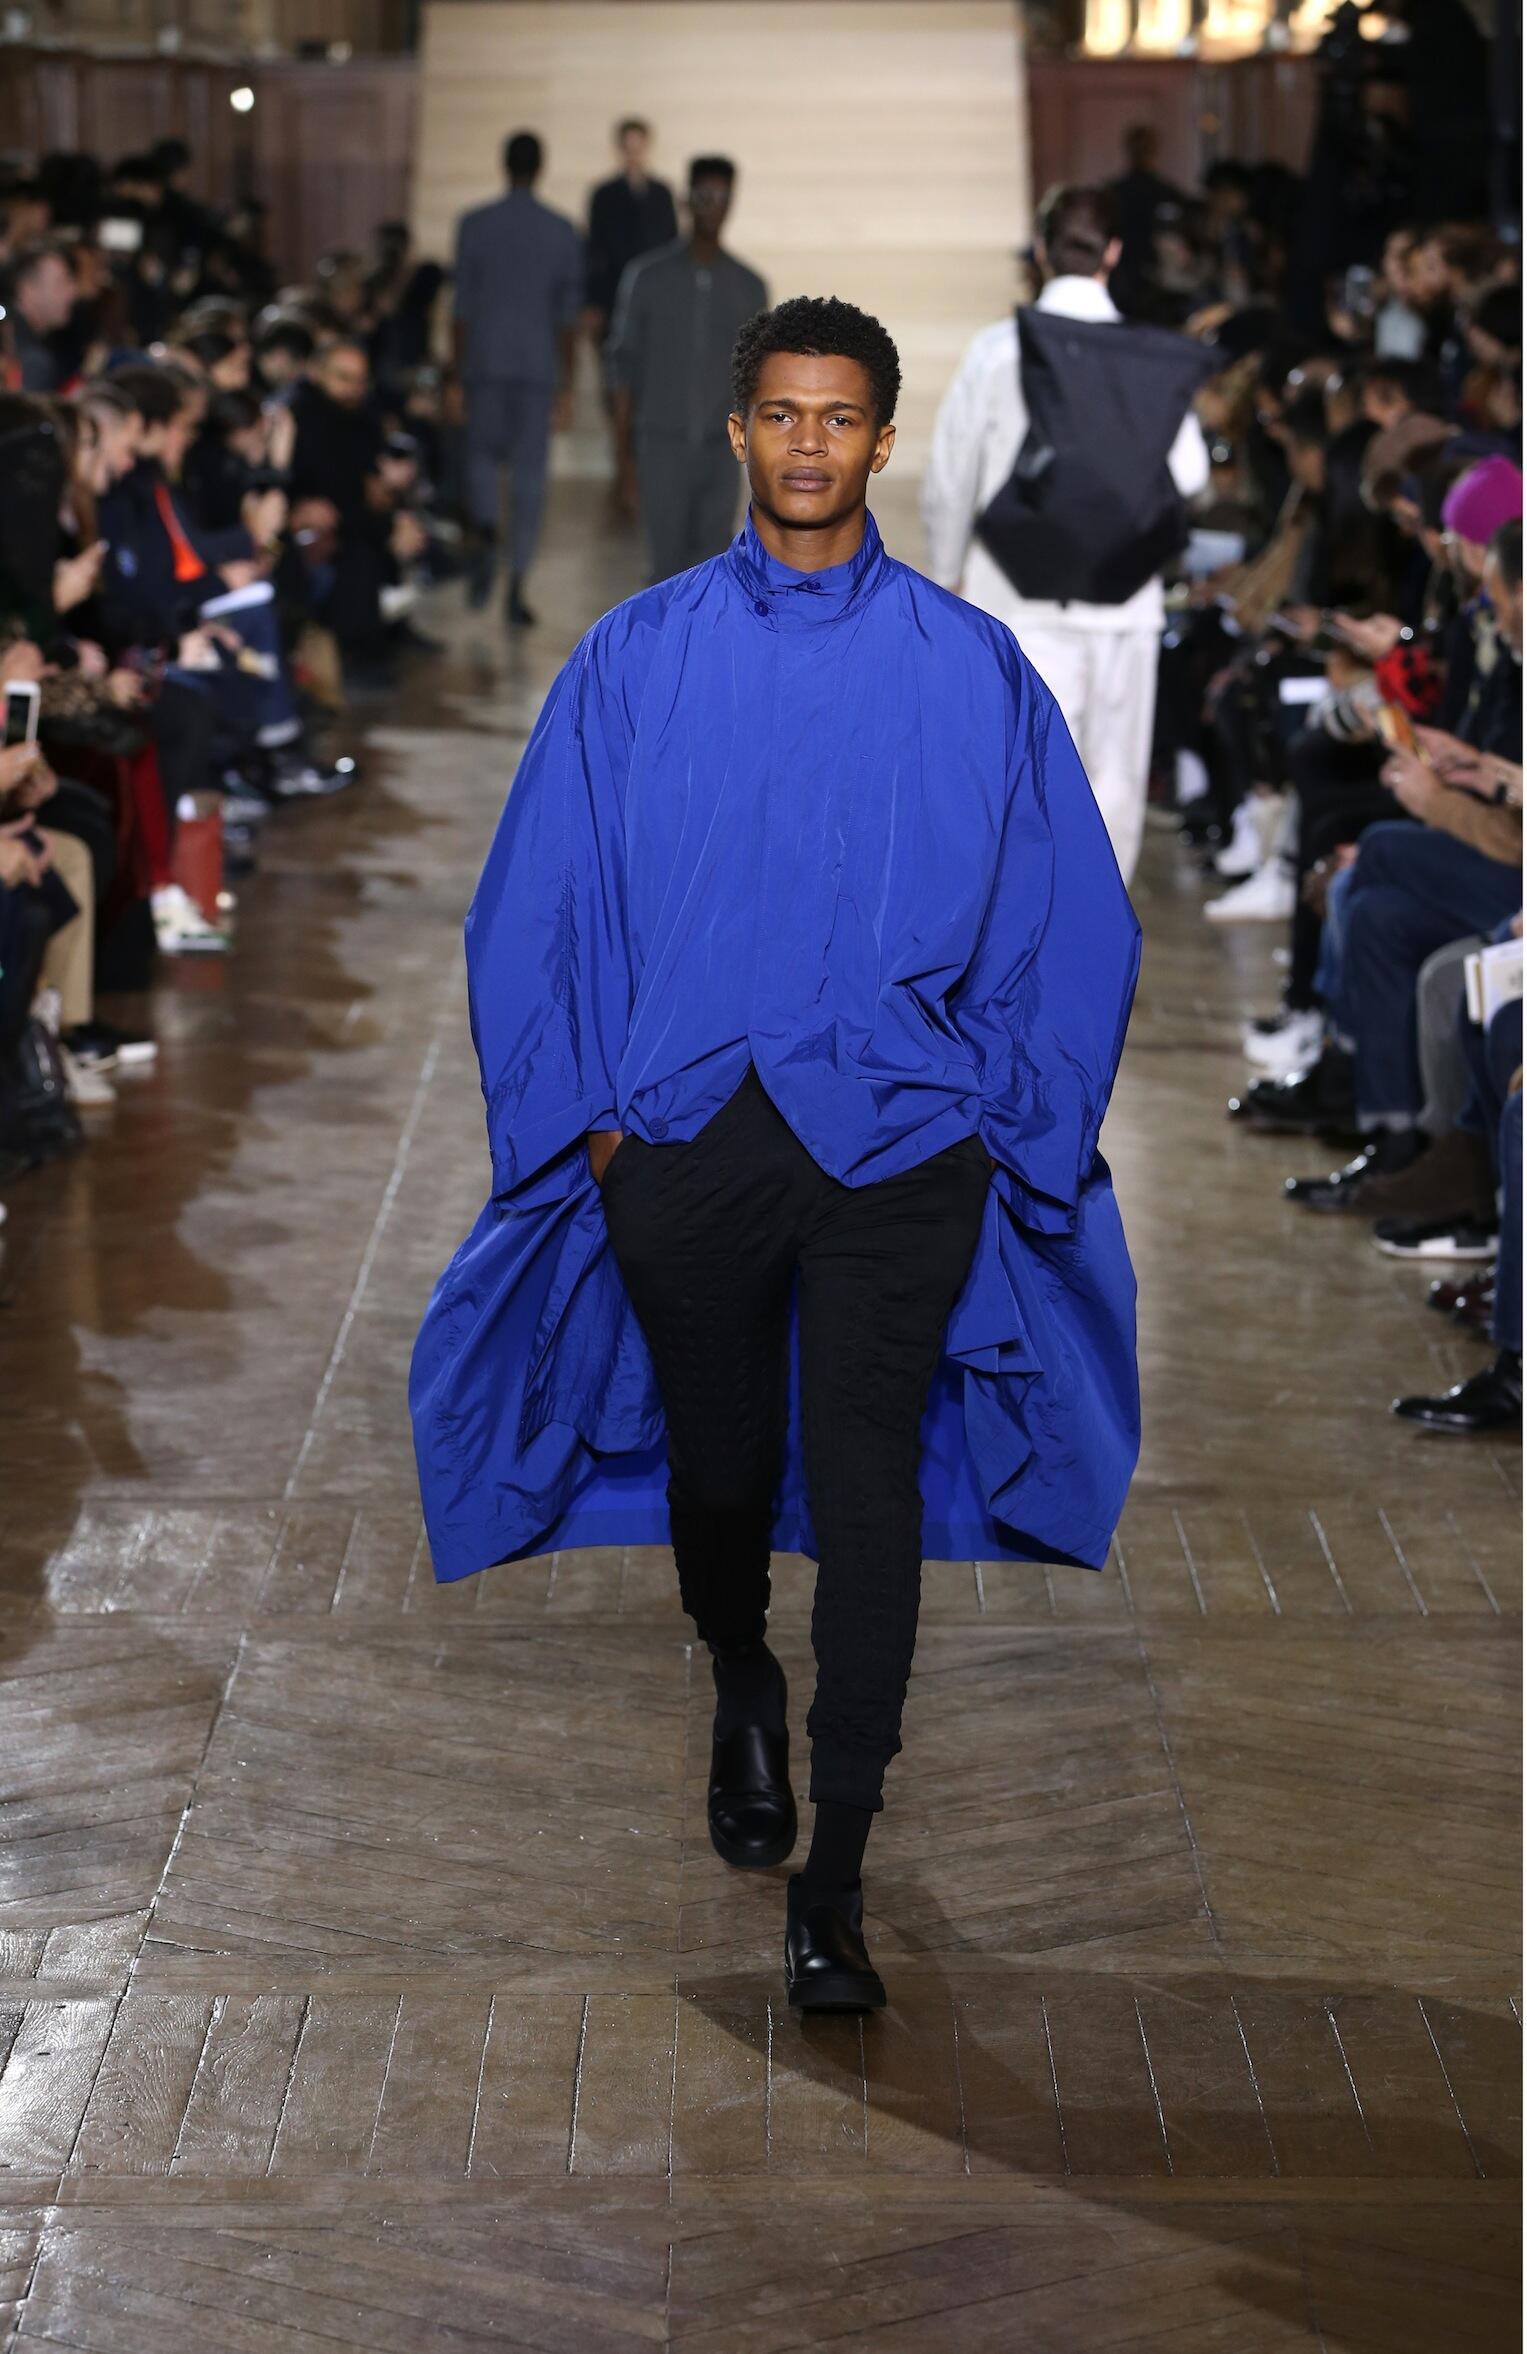 Catwalk Issey Miyake Man Fashion Show Winter 2017